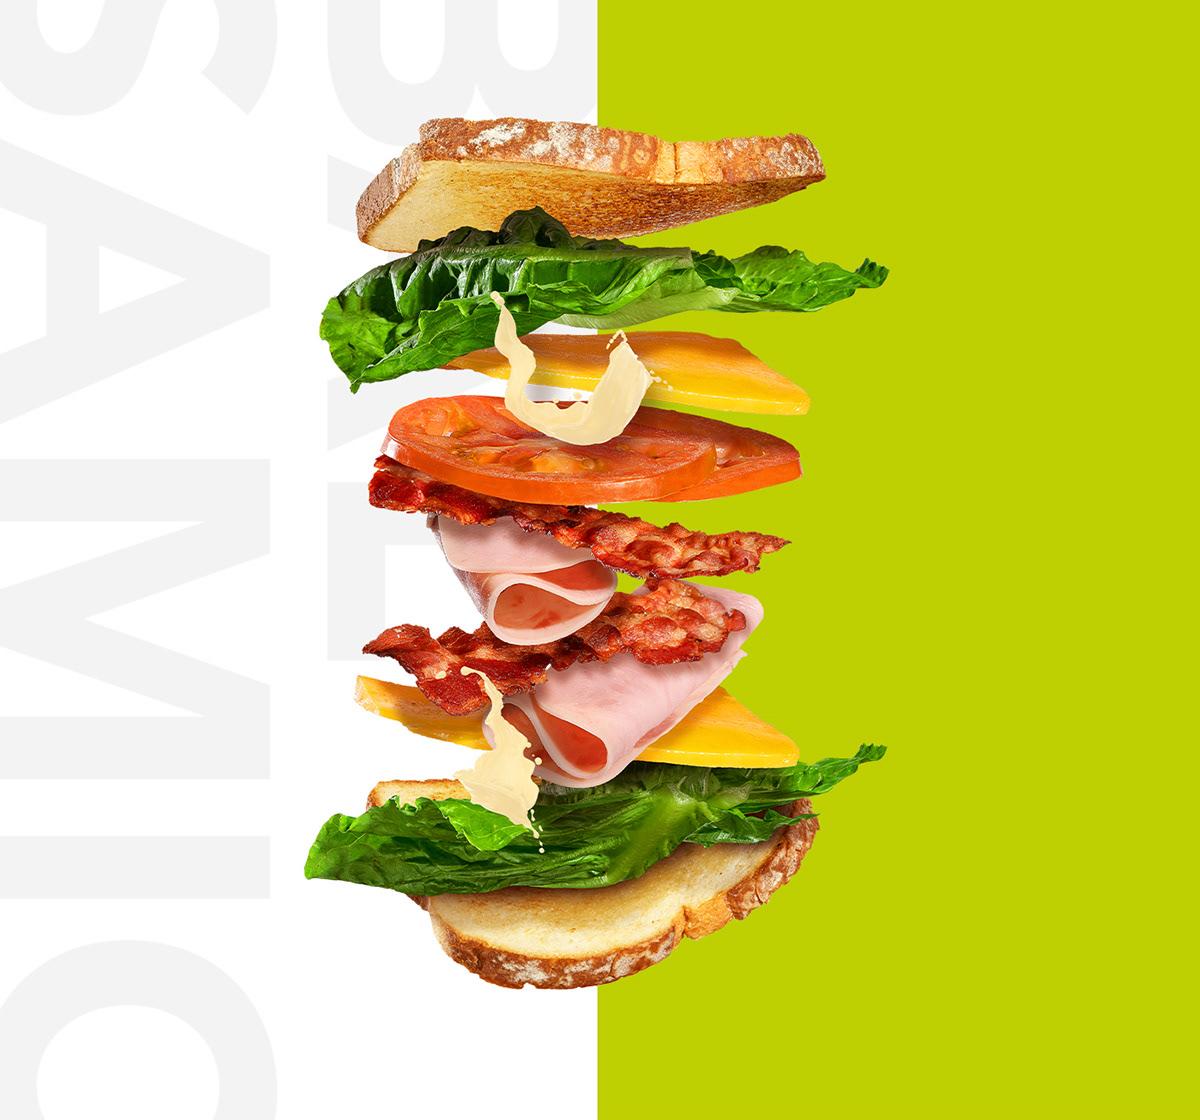 Image may contain: fast food, sandwich and hamburger